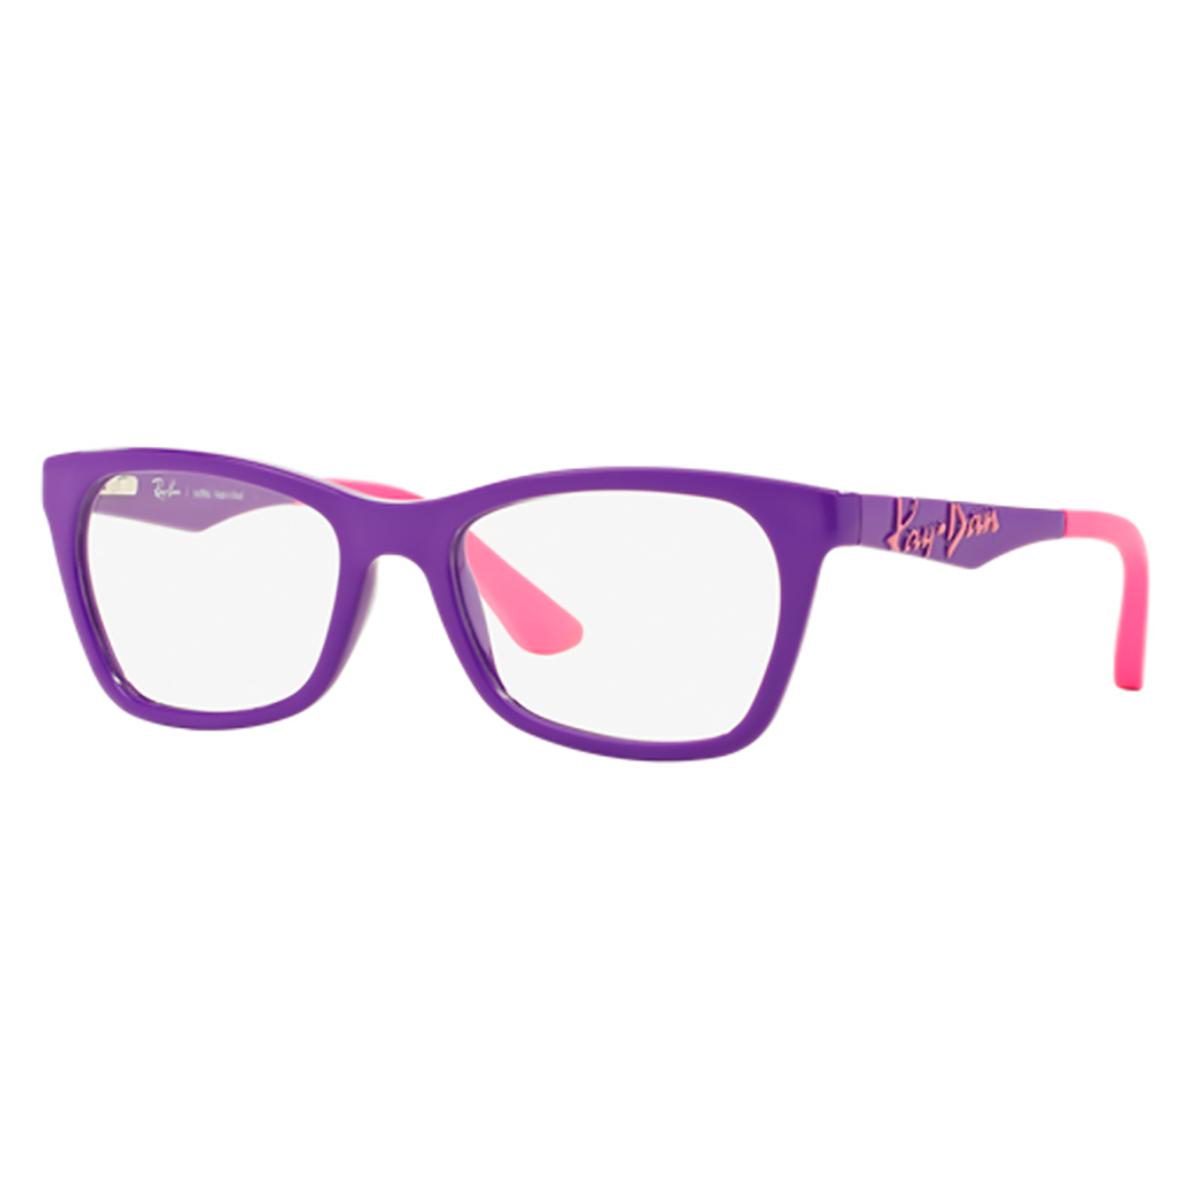 5063e101a5e14 Óculos de Grau Ray Ban Infantil RB1552l